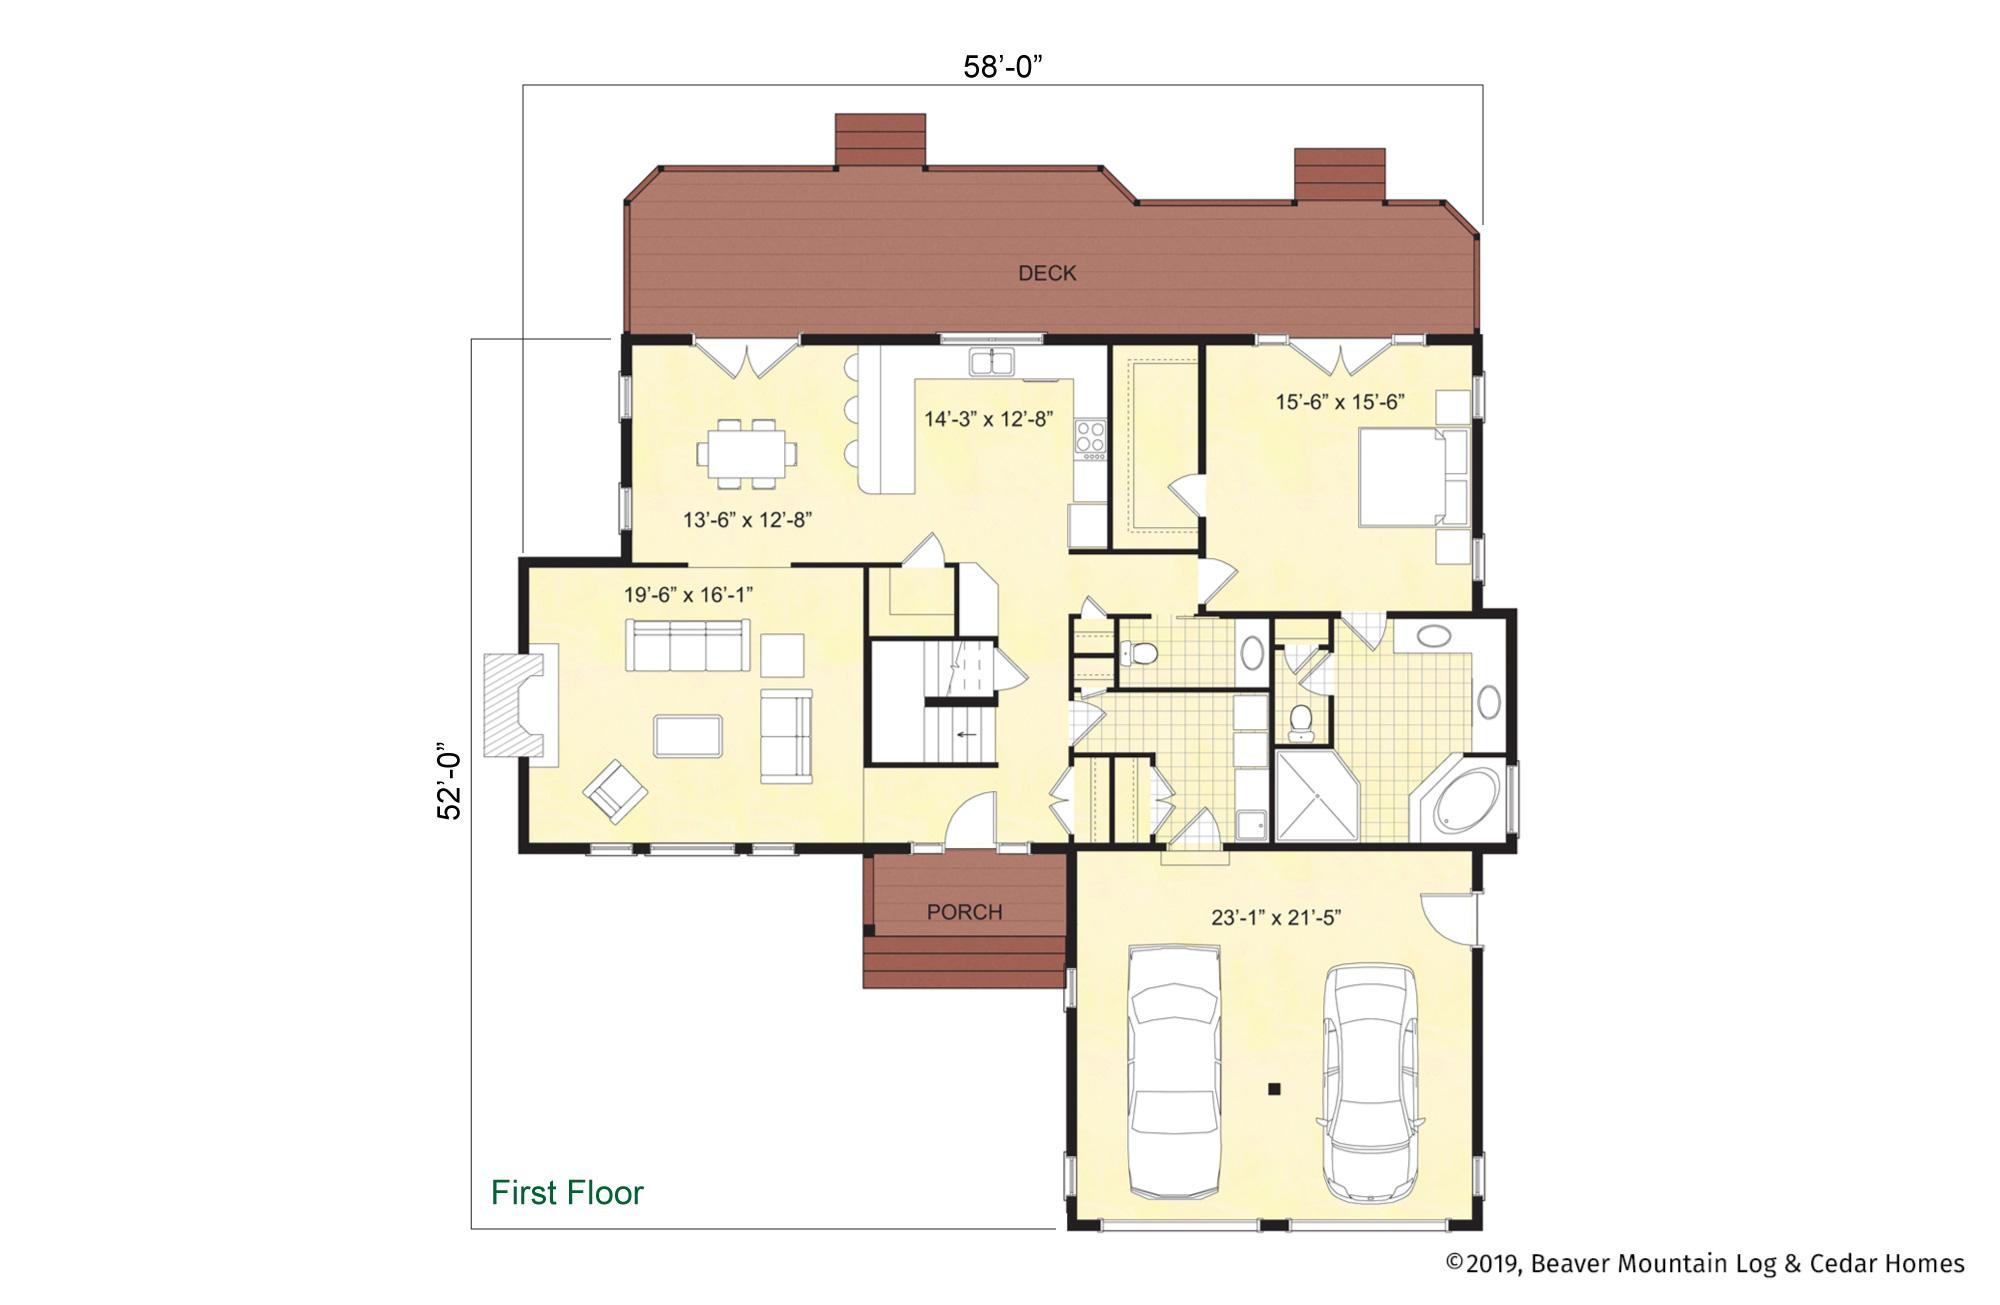 Beaver Mountain Log Homes Adirondack Main Level Floor Plan